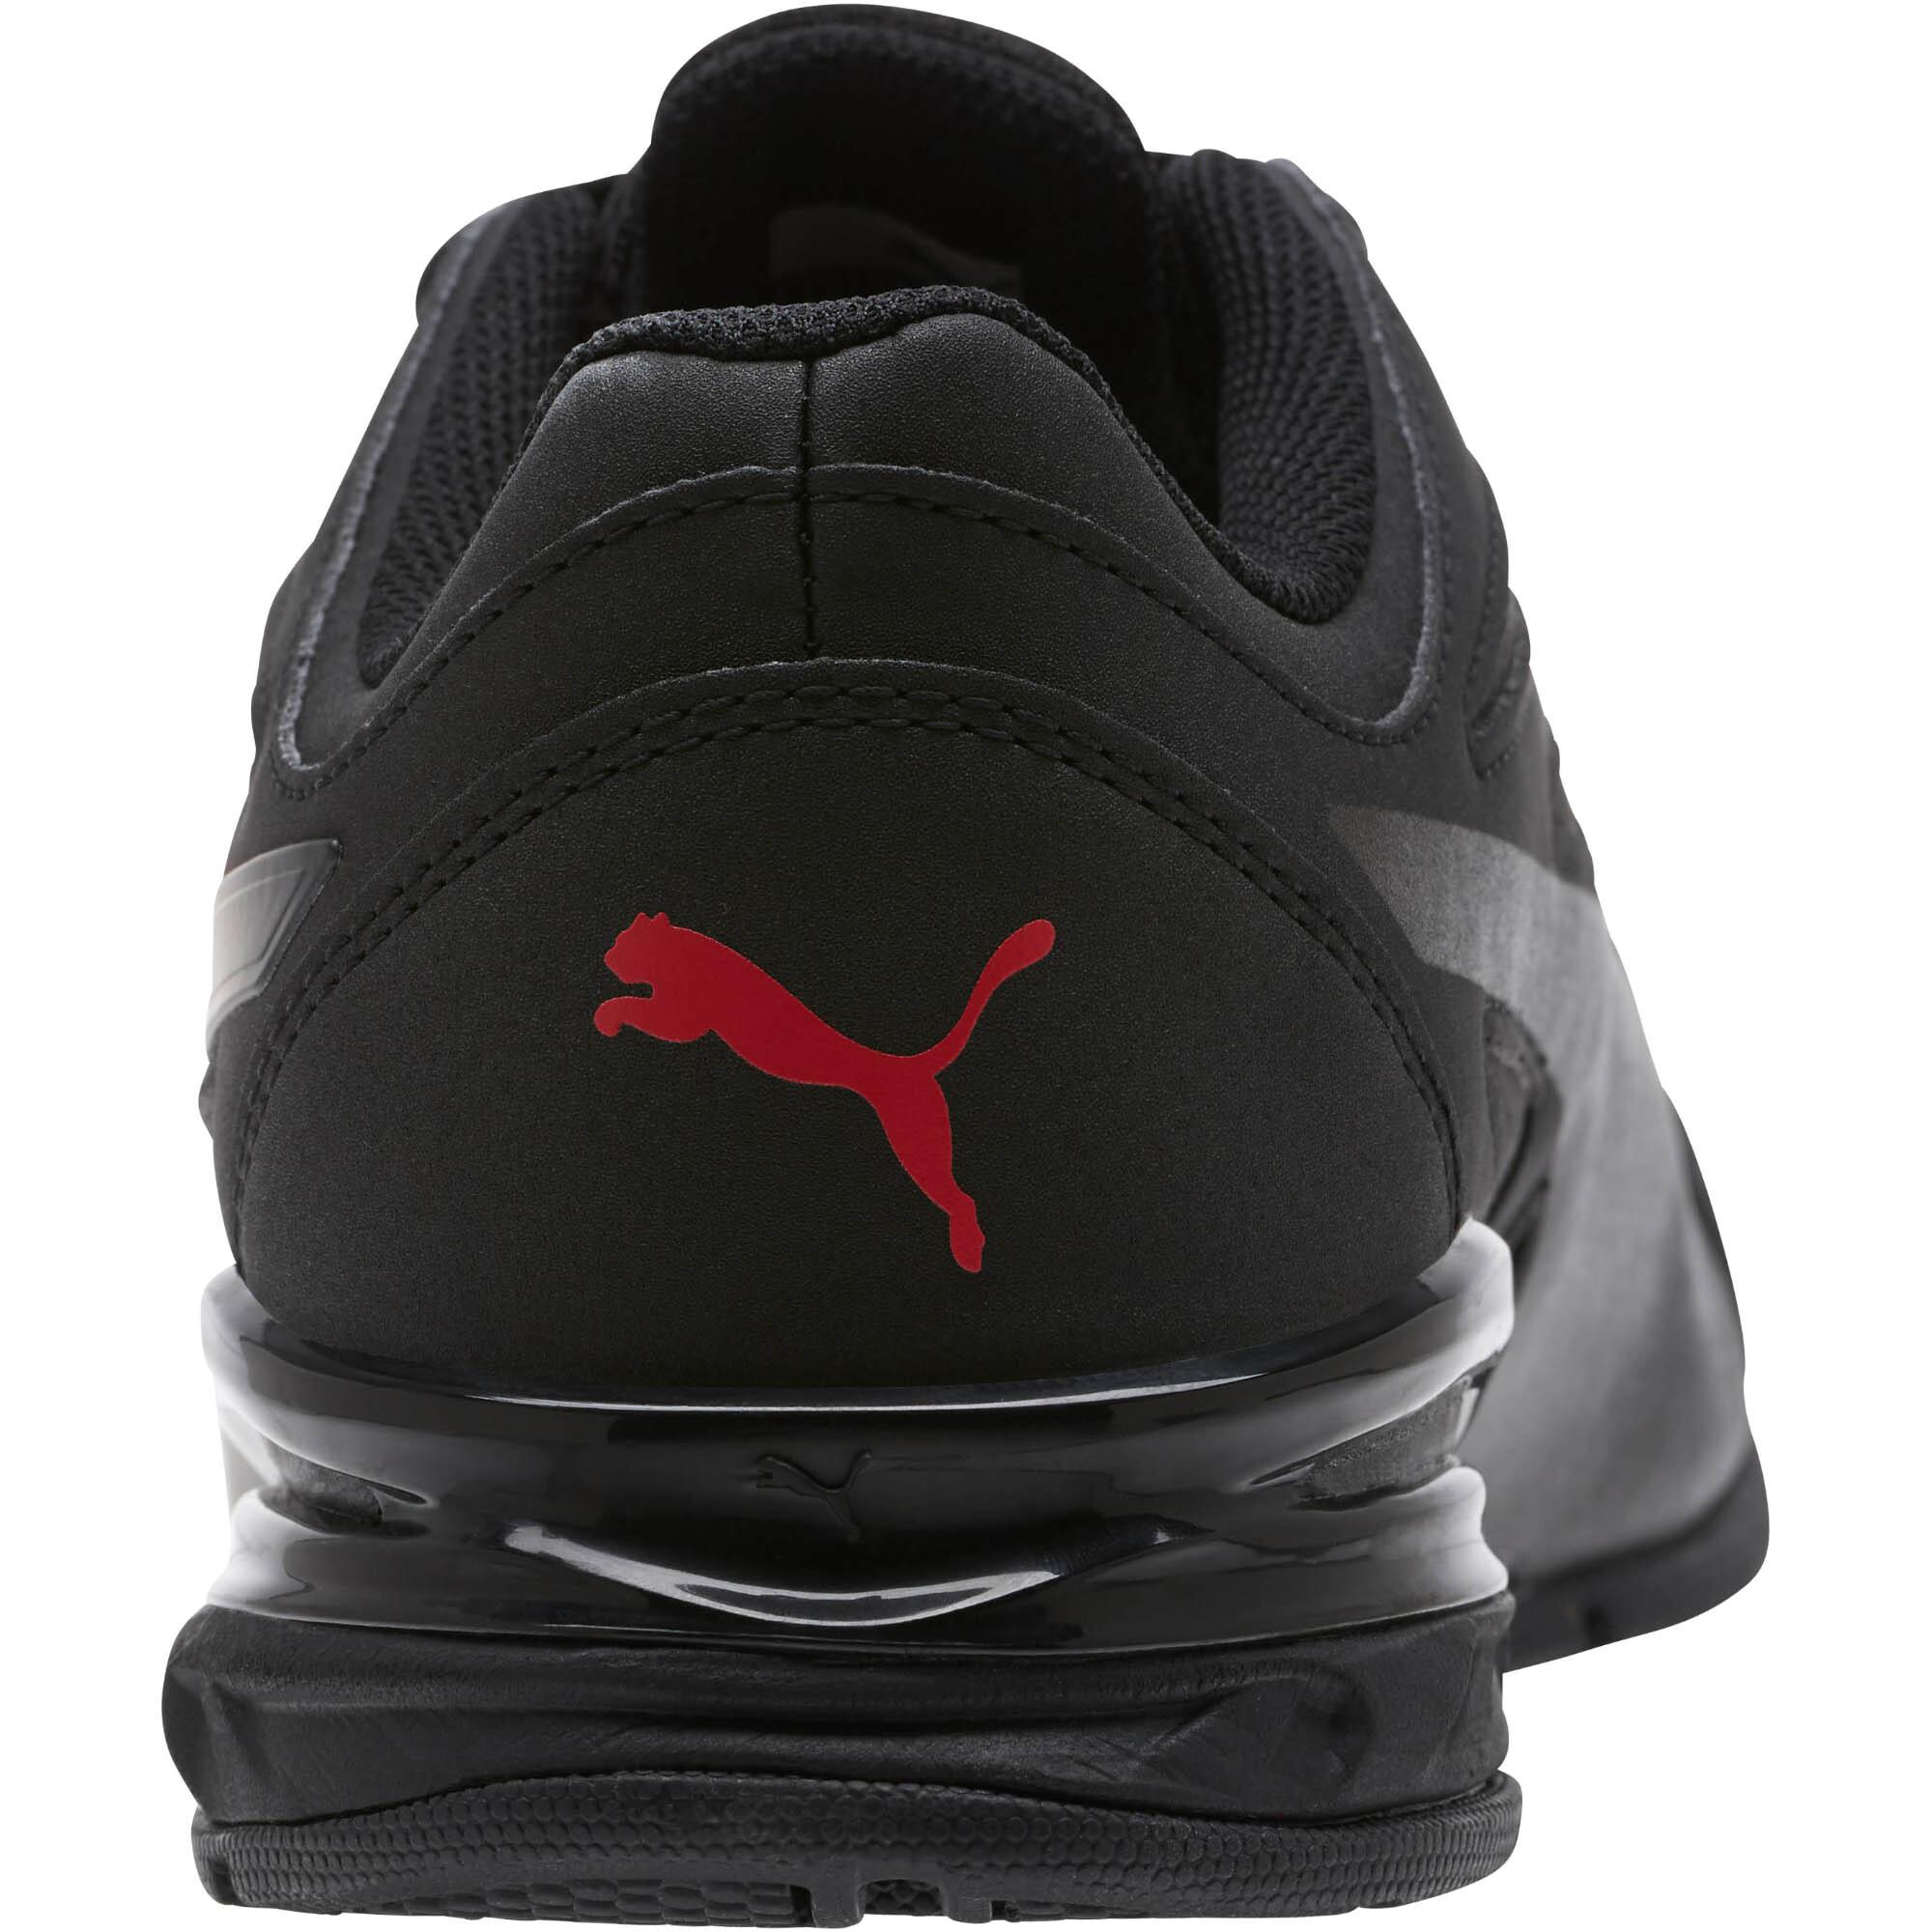 PUMA-Tazon-Modern-SL-FM-Men-039-s-Sneakers-Men-Shoe-Running thumbnail 3